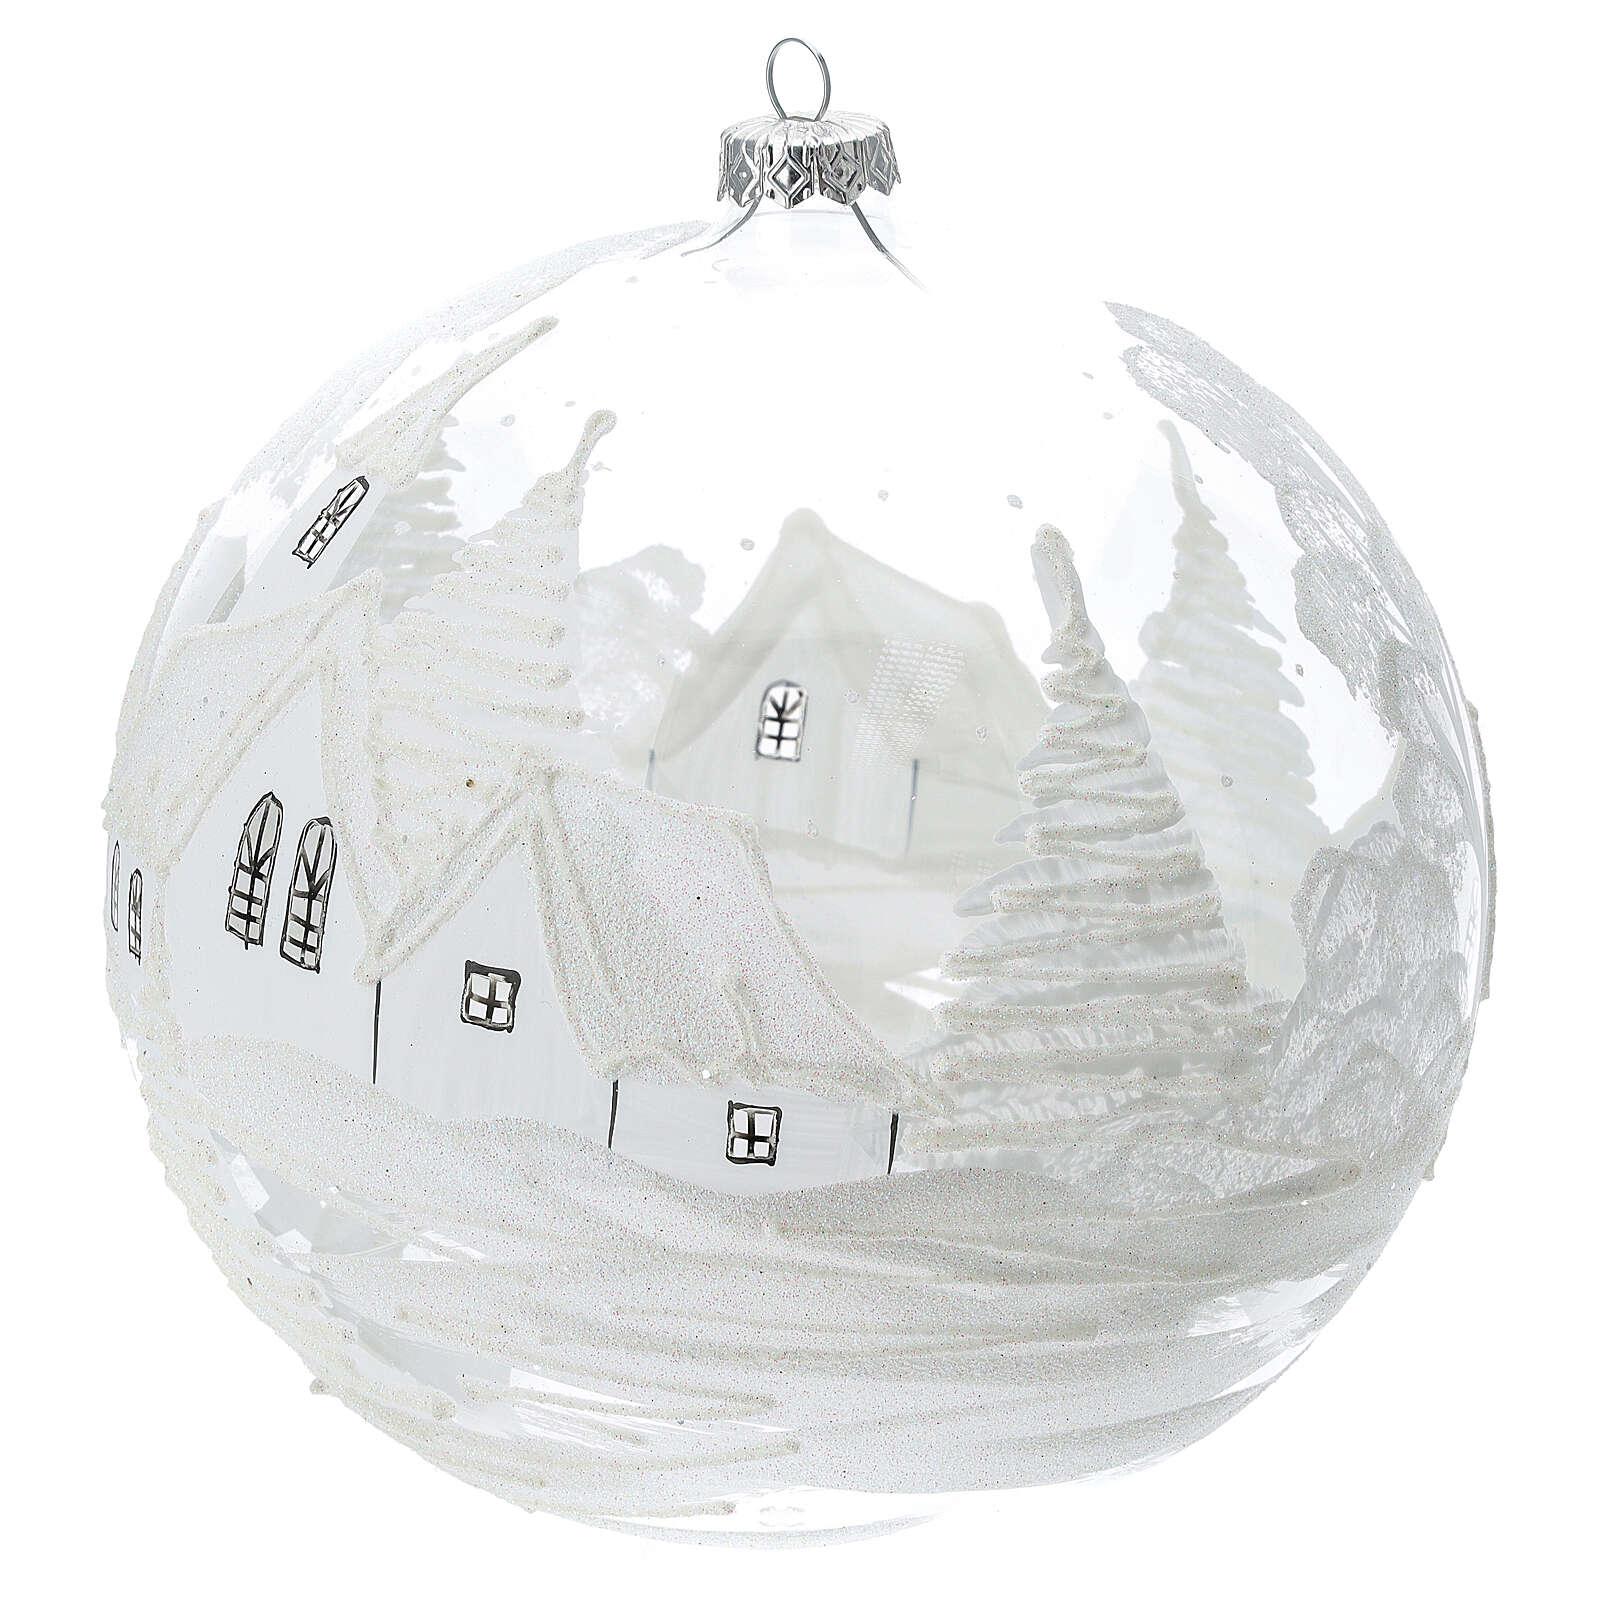 Christmas ball ornament white snowy village blown glass 200 mm 4